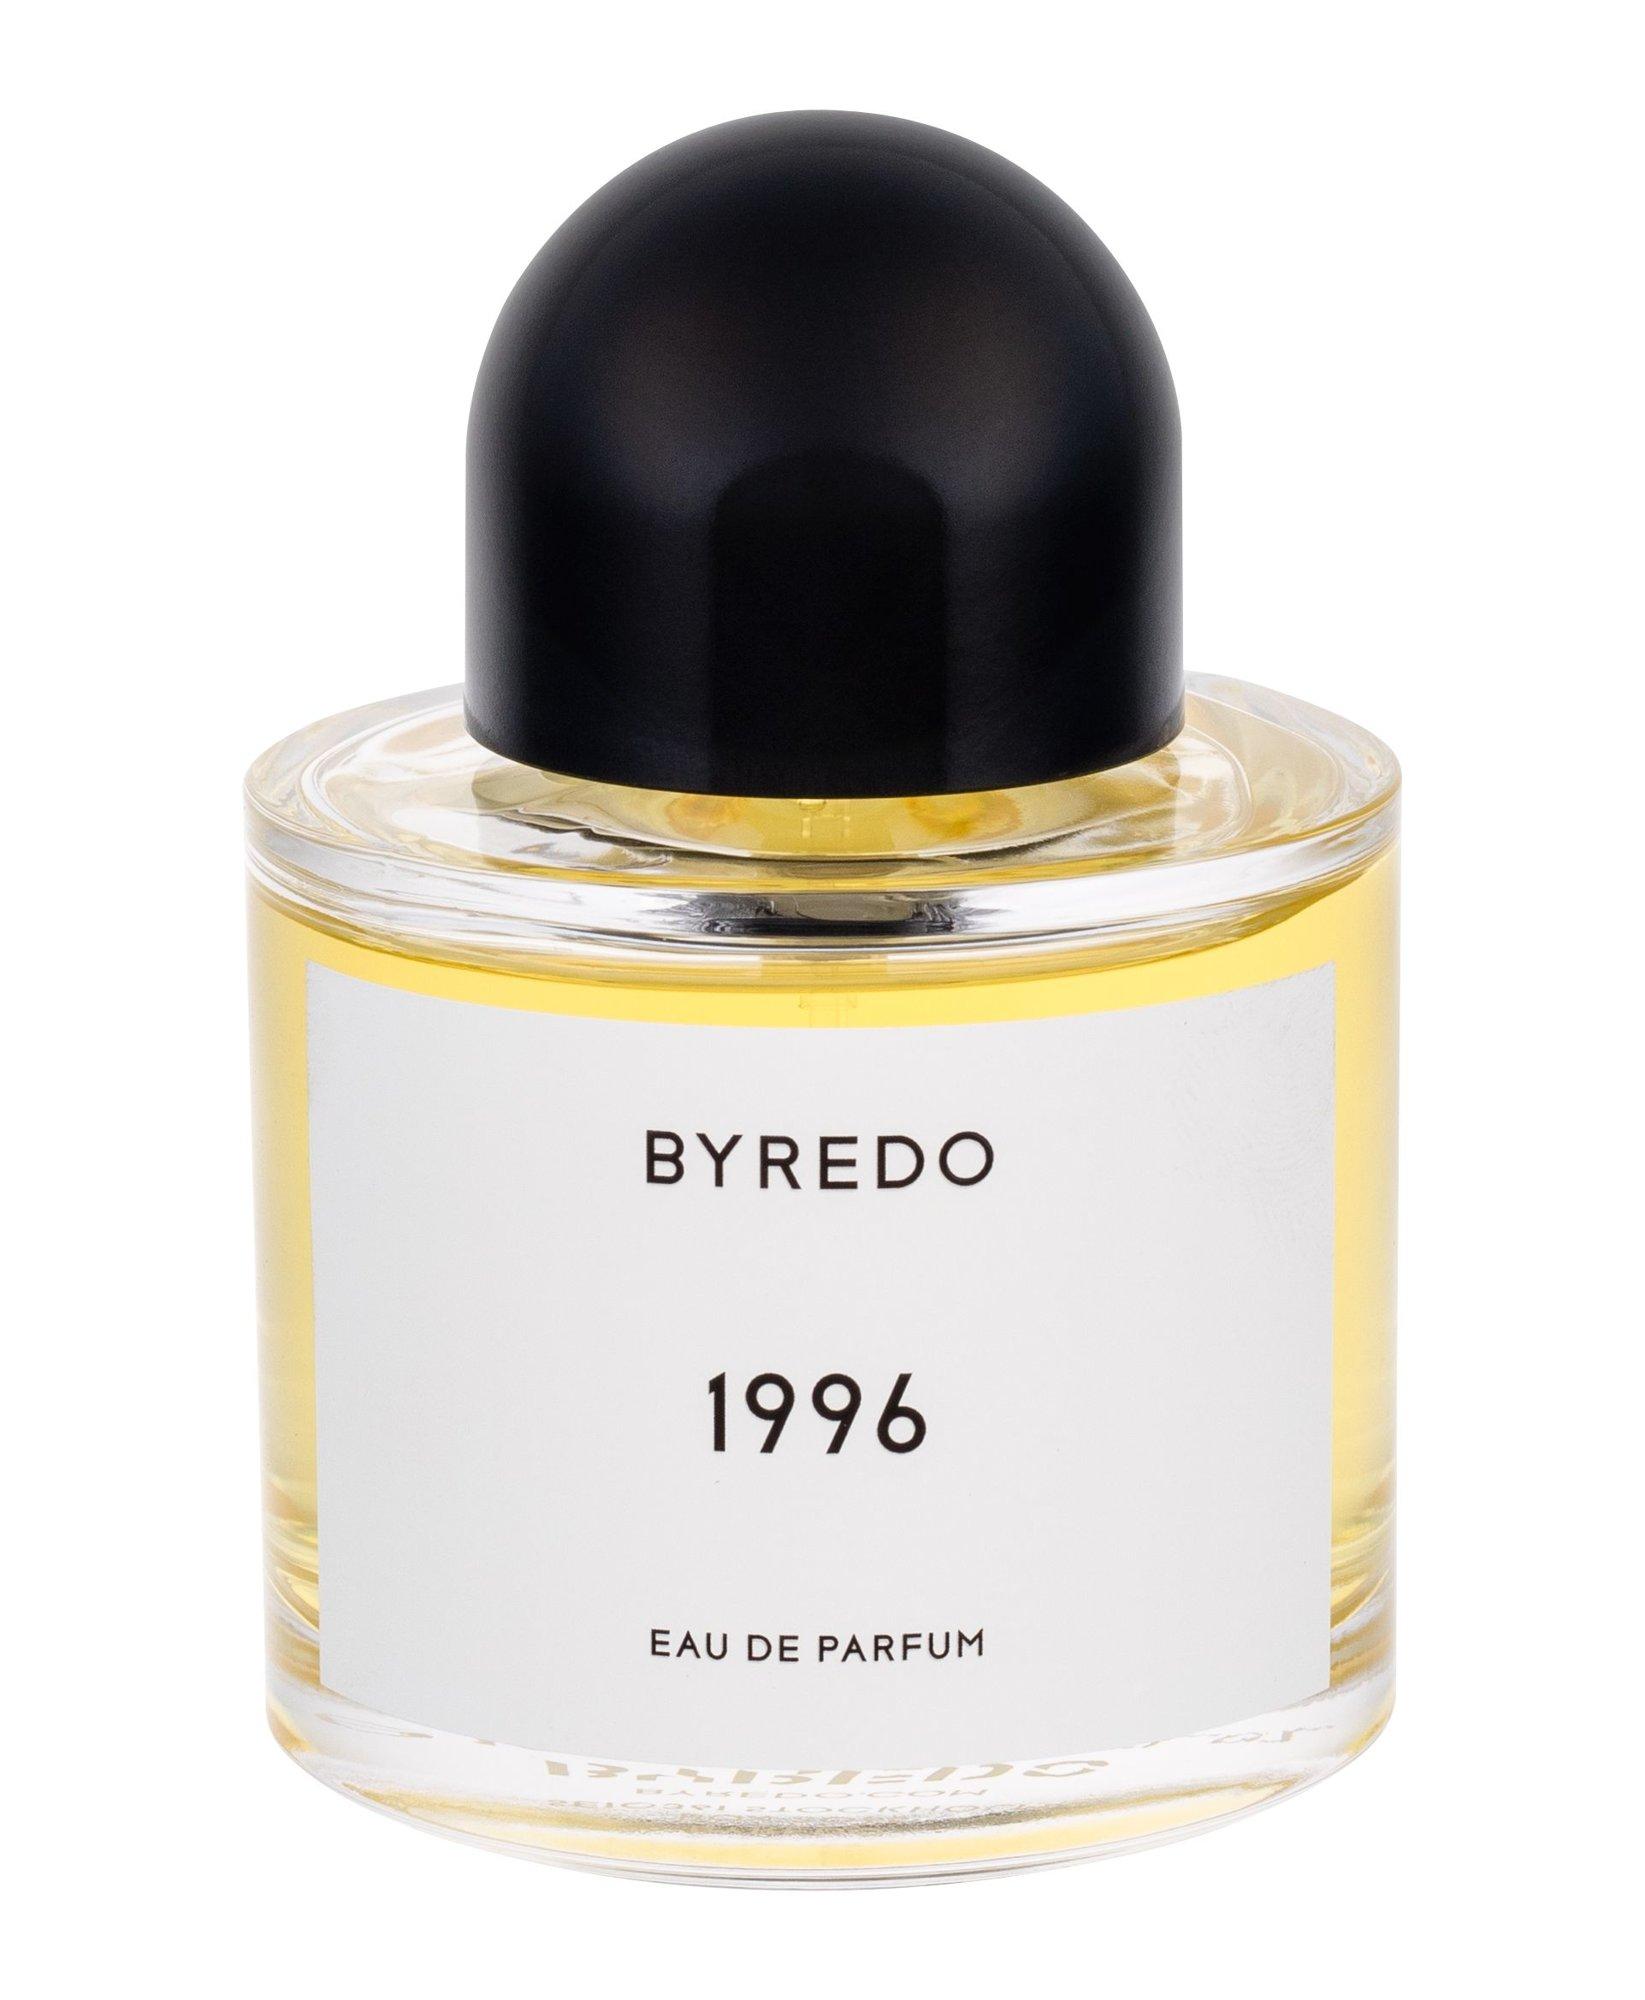 BYREDO 1996 Inez & Vinoodh Eau de Parfum 100ml